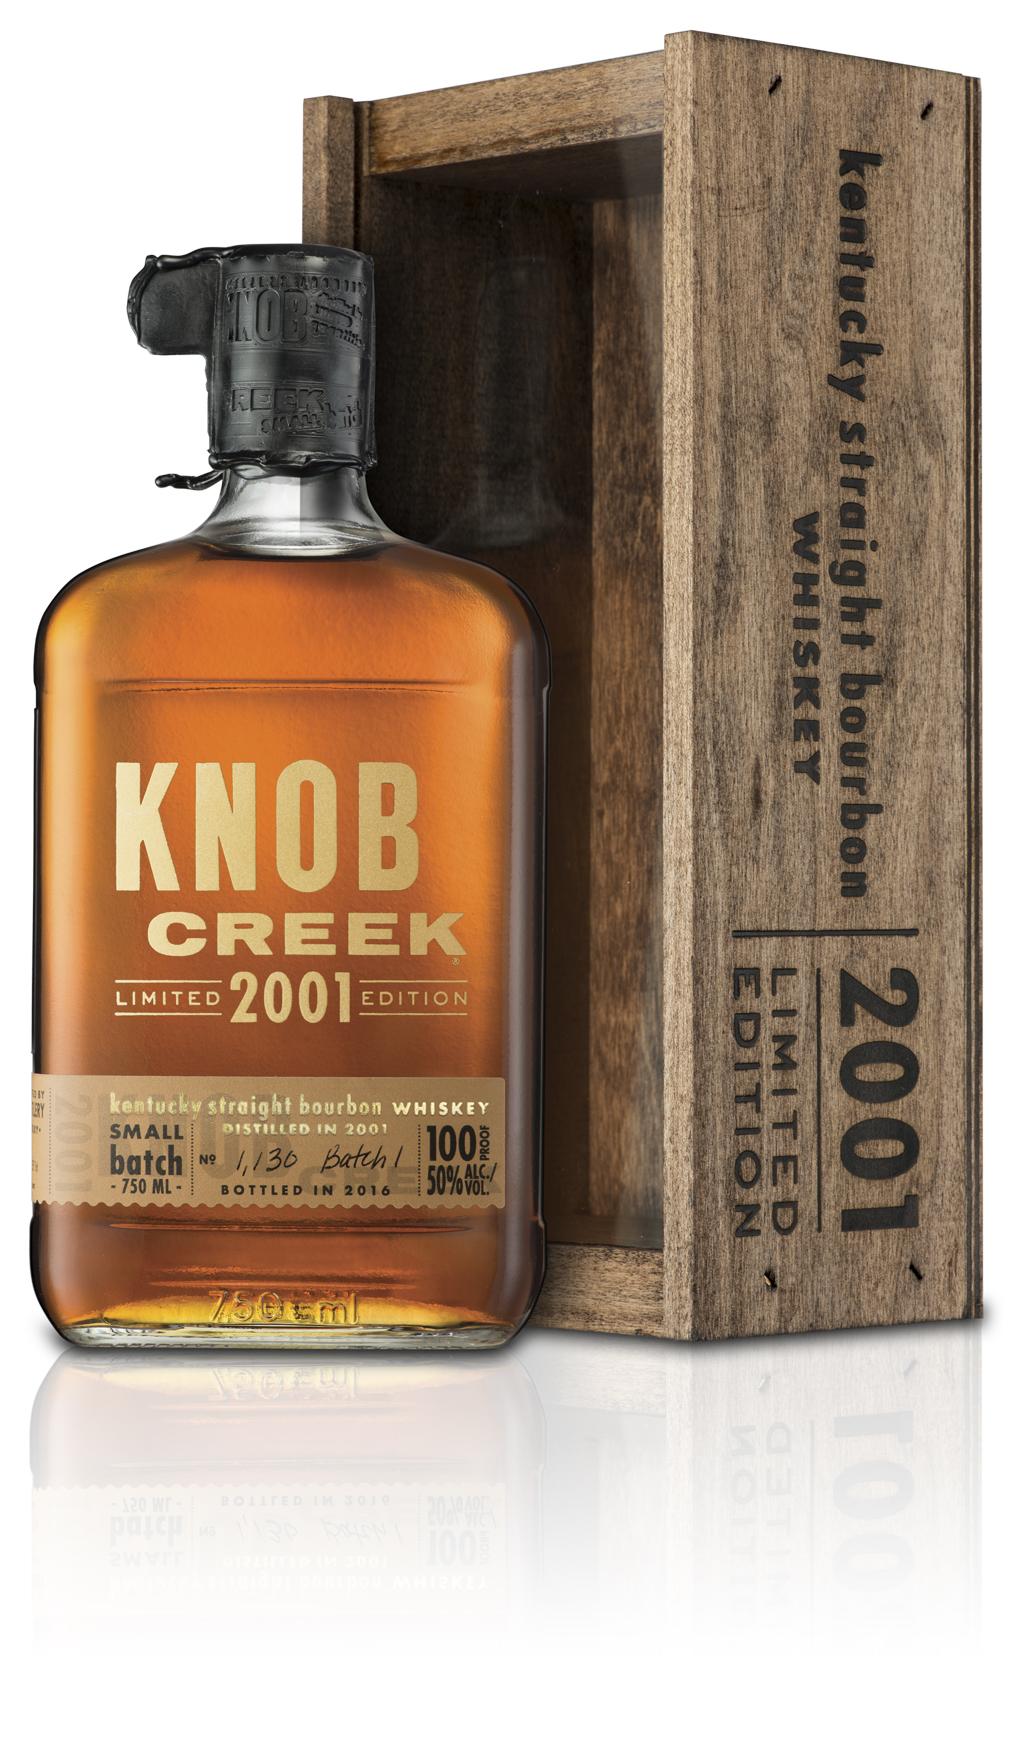 Knob Creek 2001_bottle with box.jpg